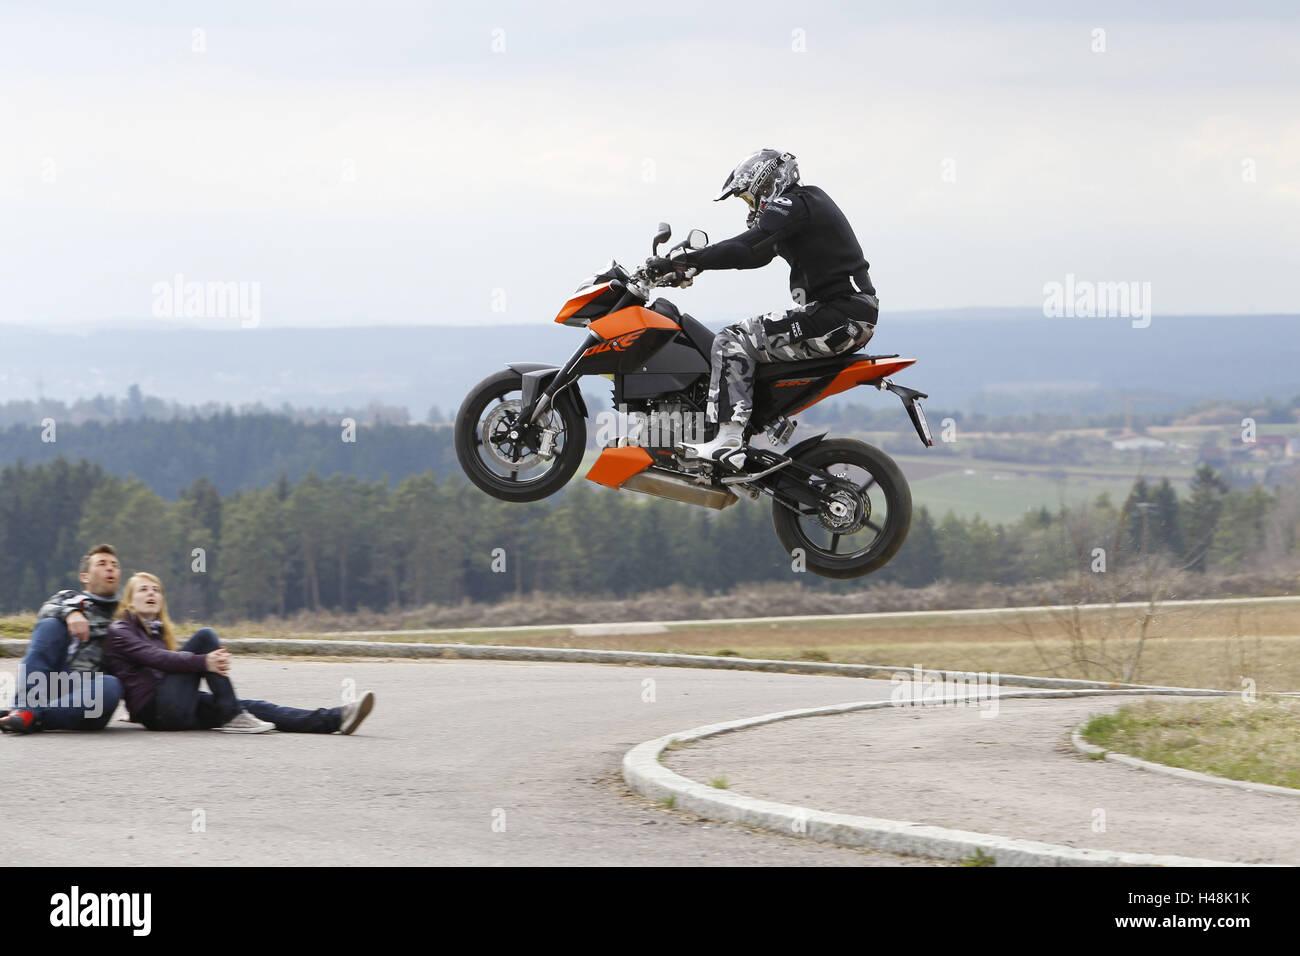 Motorcyclist, motorcycle, KTM, fun bike, jump, amazed couple, - Stock Image